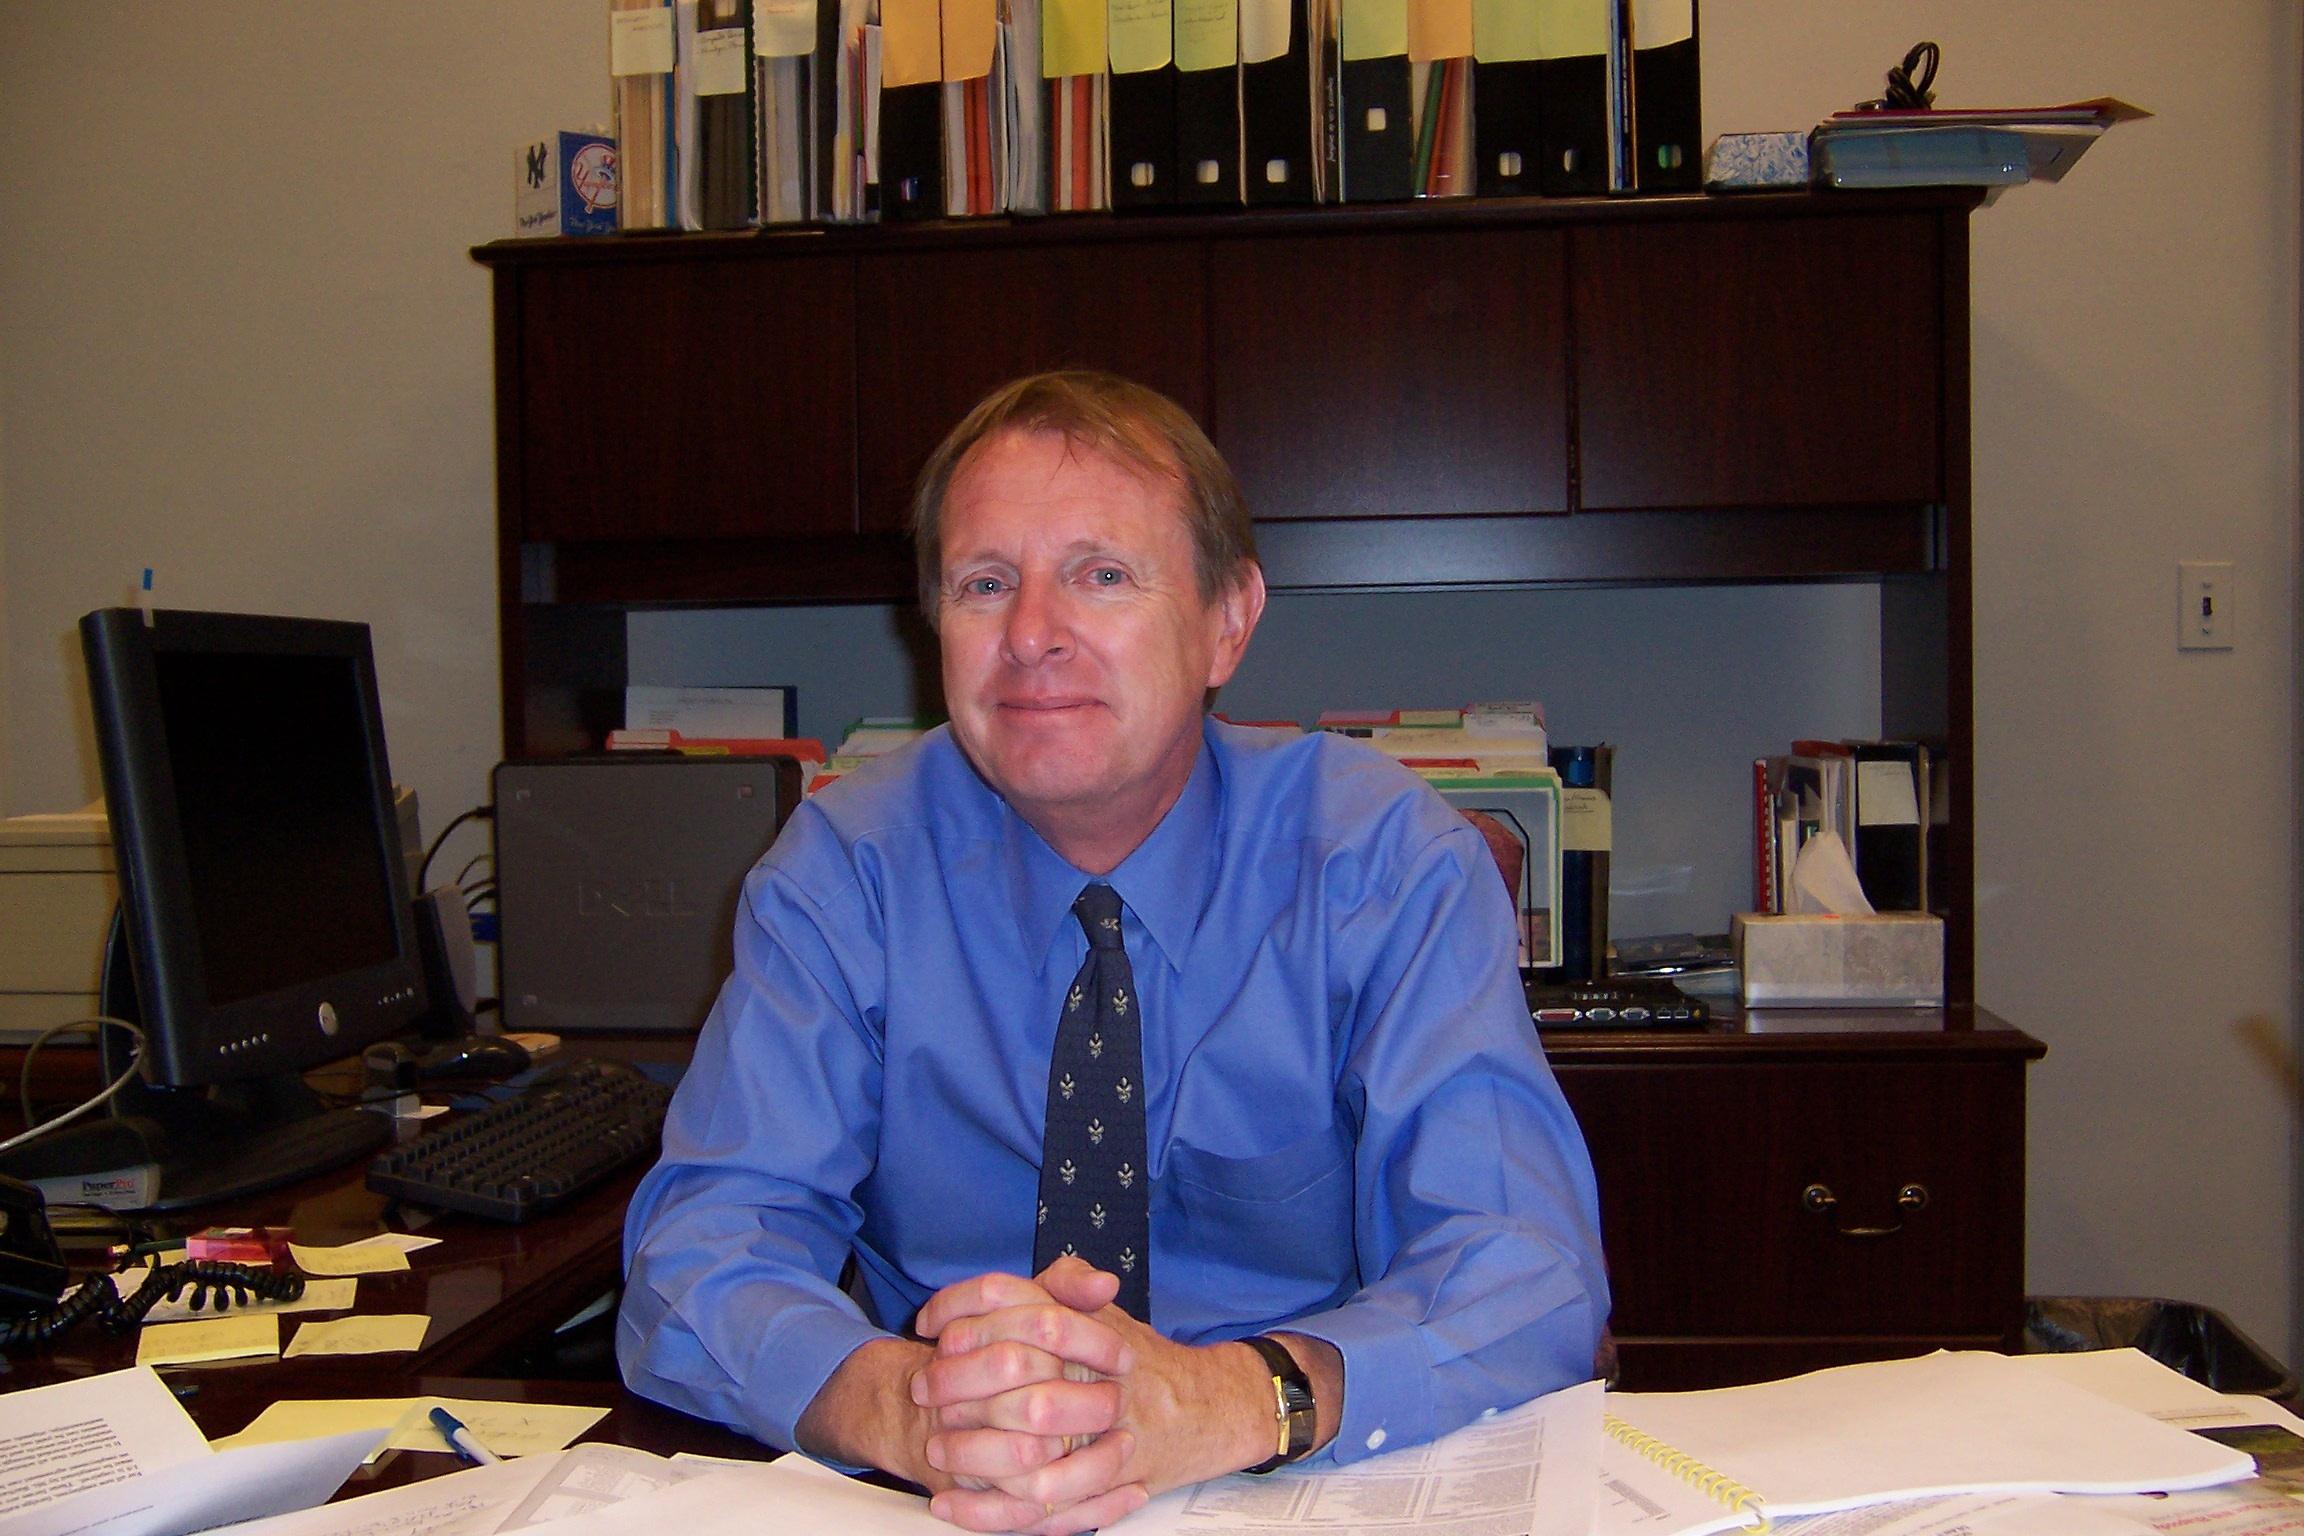 Dr. Tim Ward